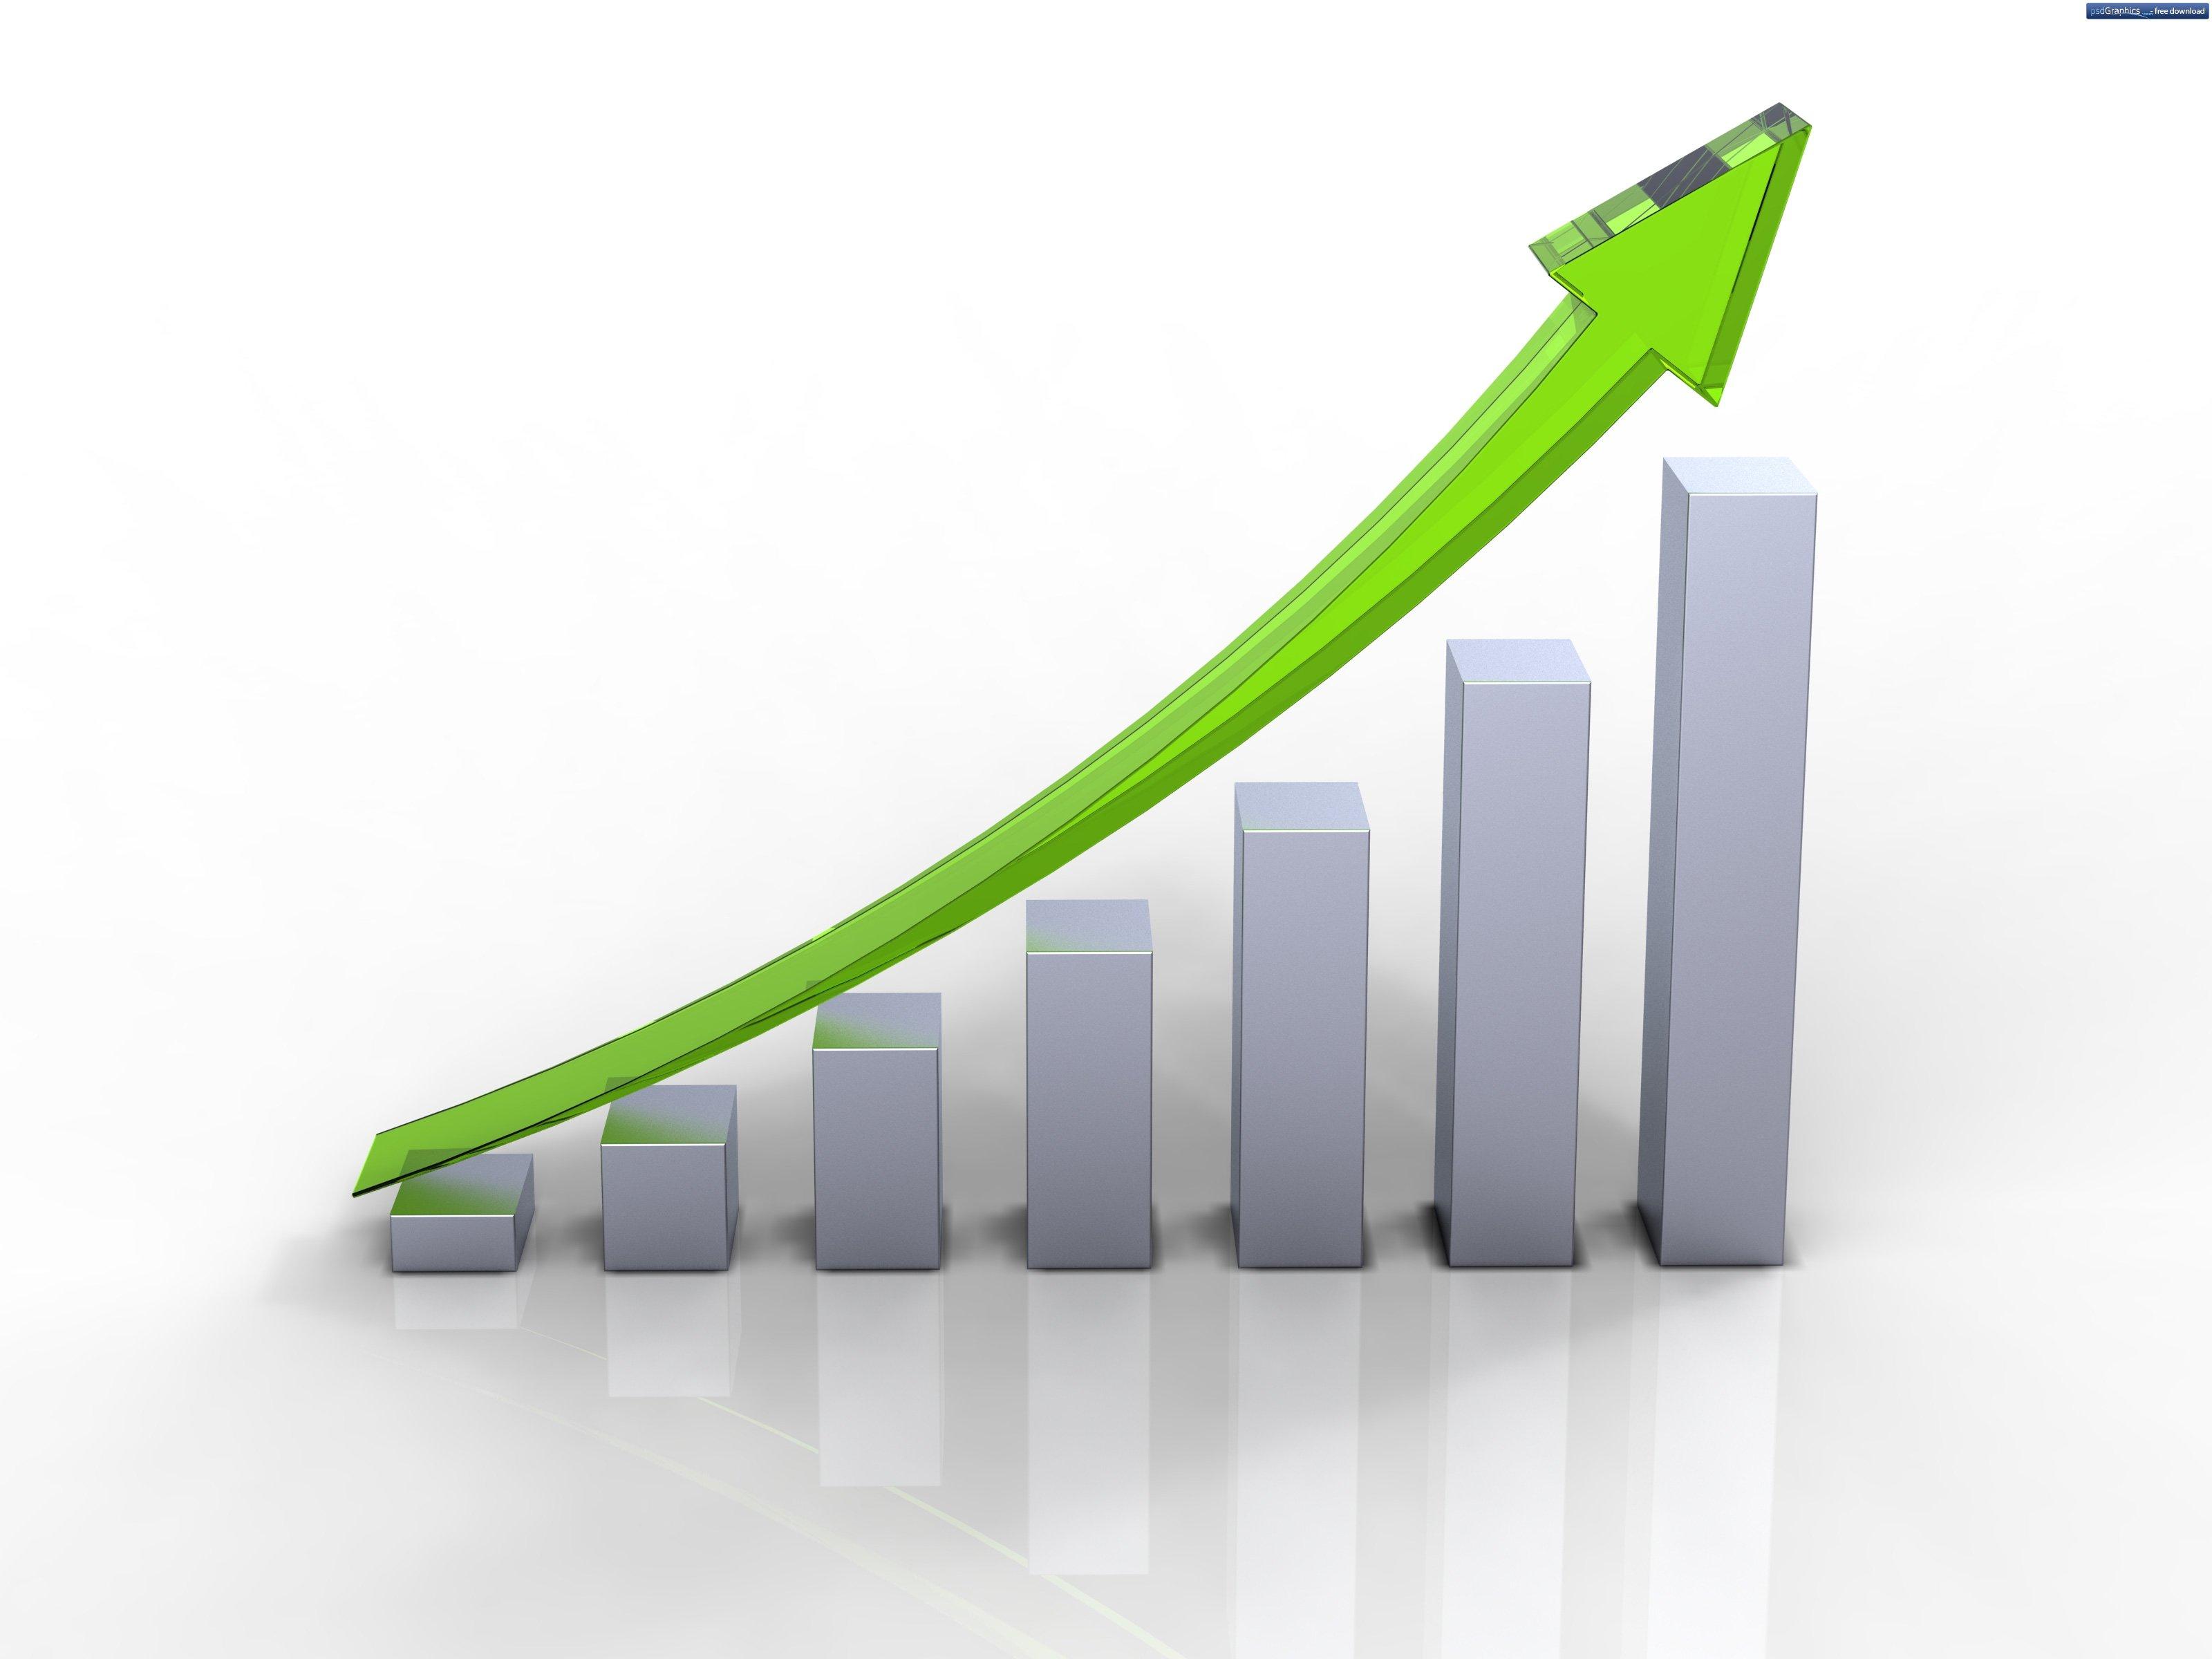 http://boombet.net/images/upload/green-business-graph.jpg